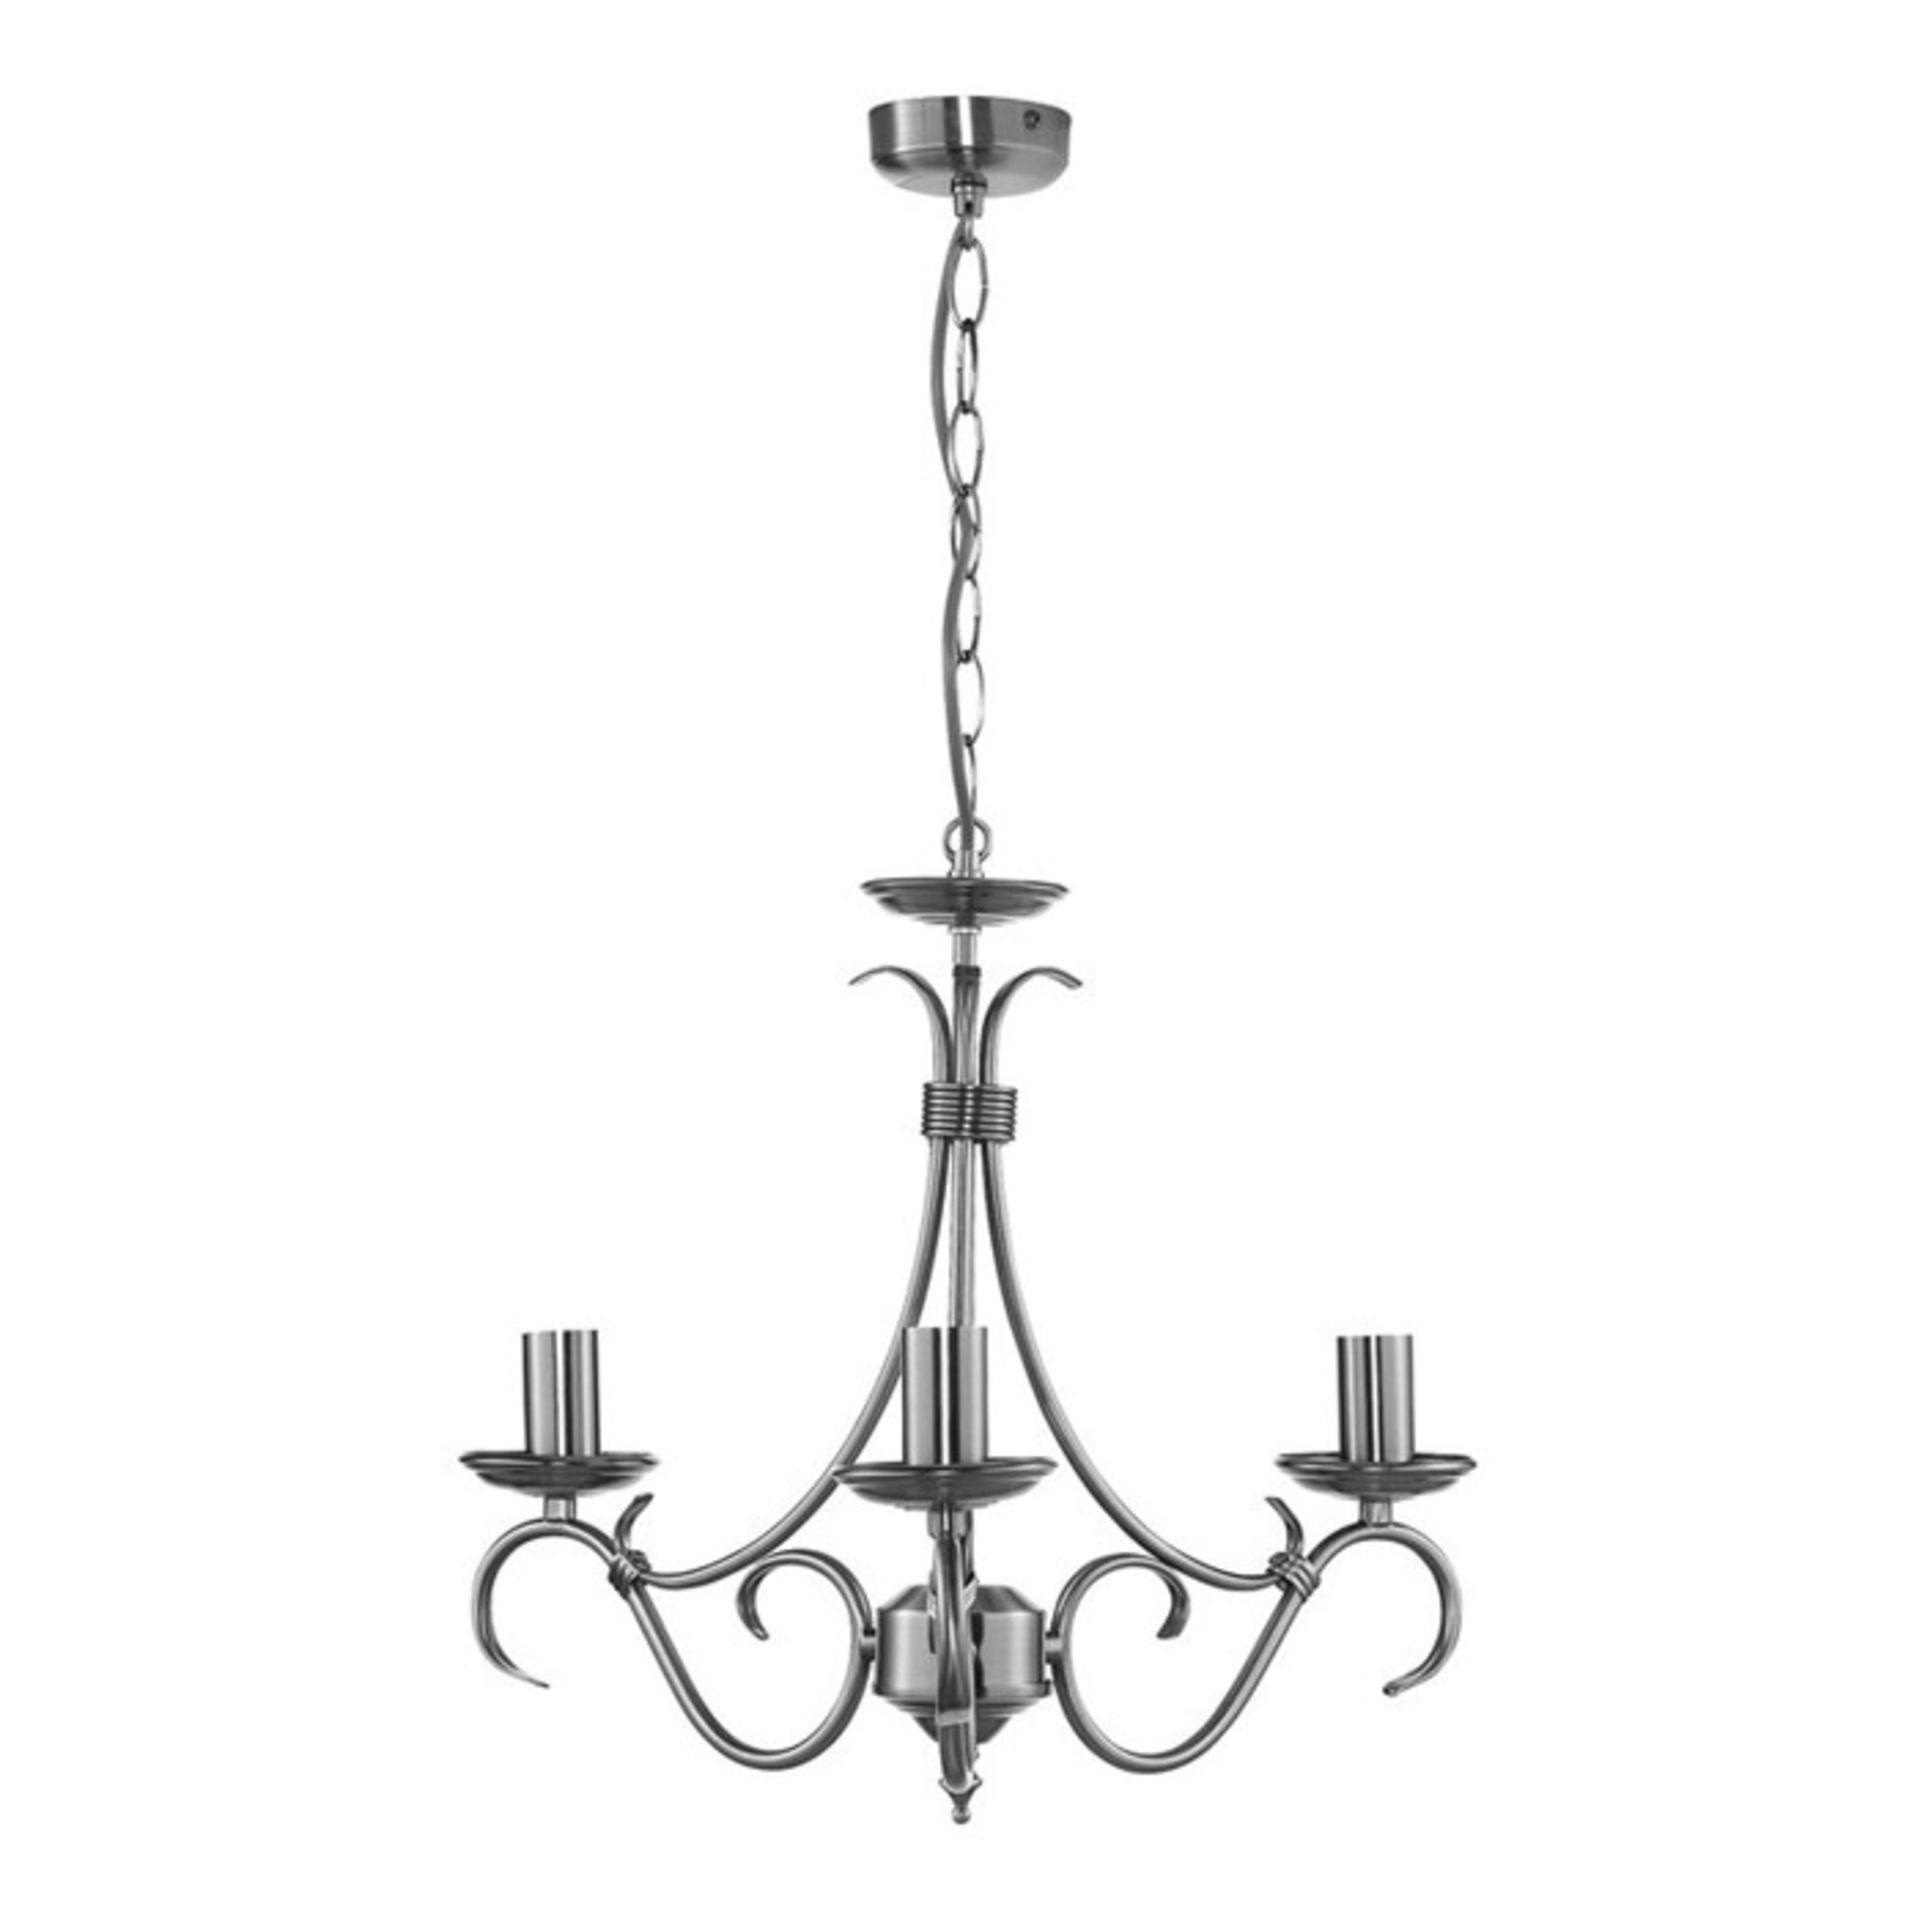 Endon Lighting, Bernice 3-Light Candle Style Chandelier (ANTIQUE BRASS) - RRP £52.99 (UEL1478 -